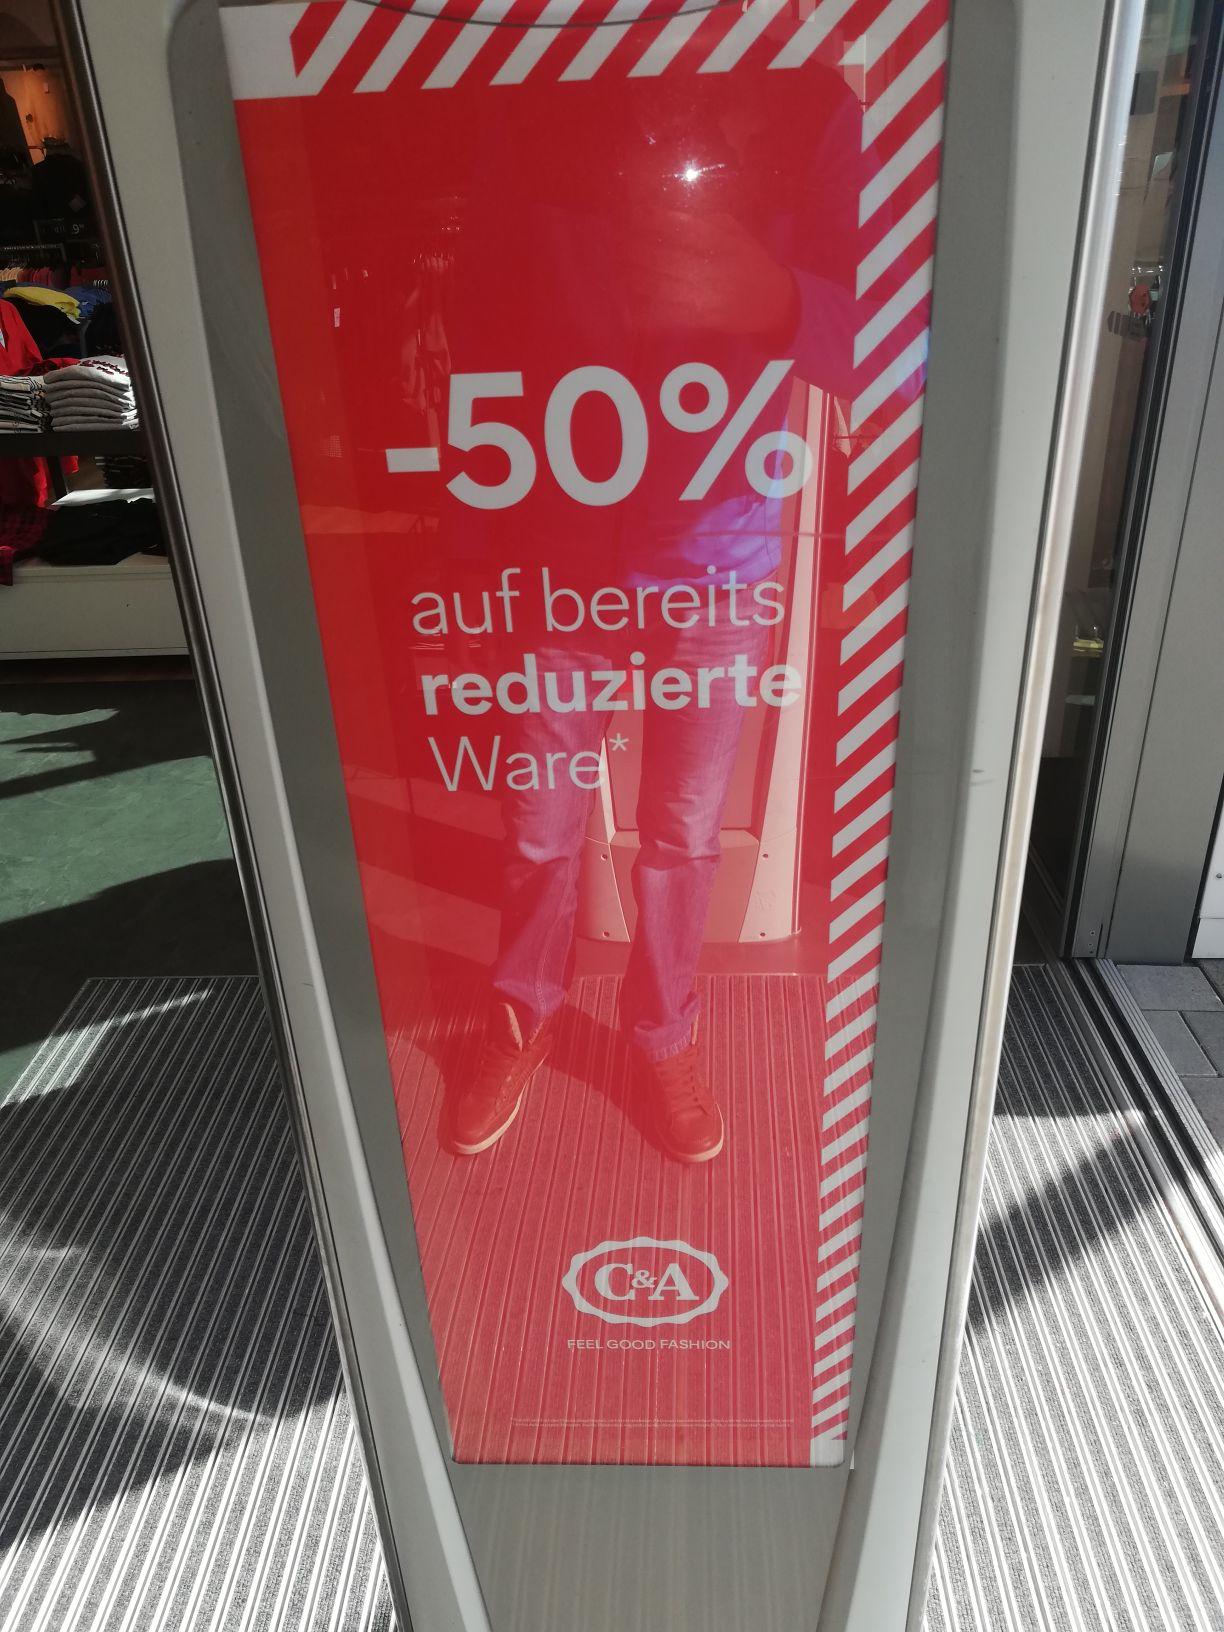 C&A minus 50 Prozent auf alles reduzierte